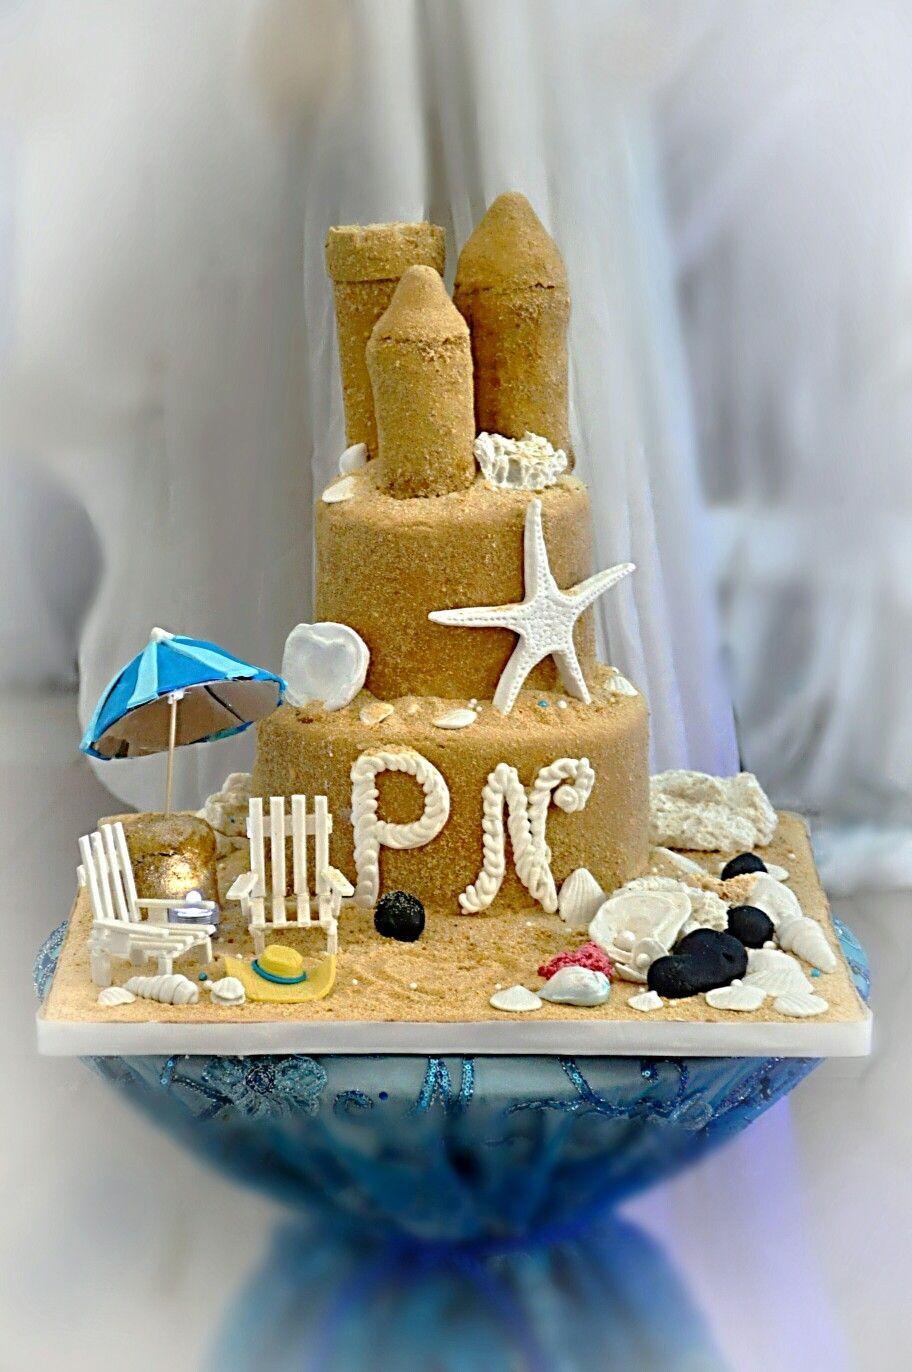 Pin by La Maison du Gâteau on wedding cakes | Pinterest | Wedding ...